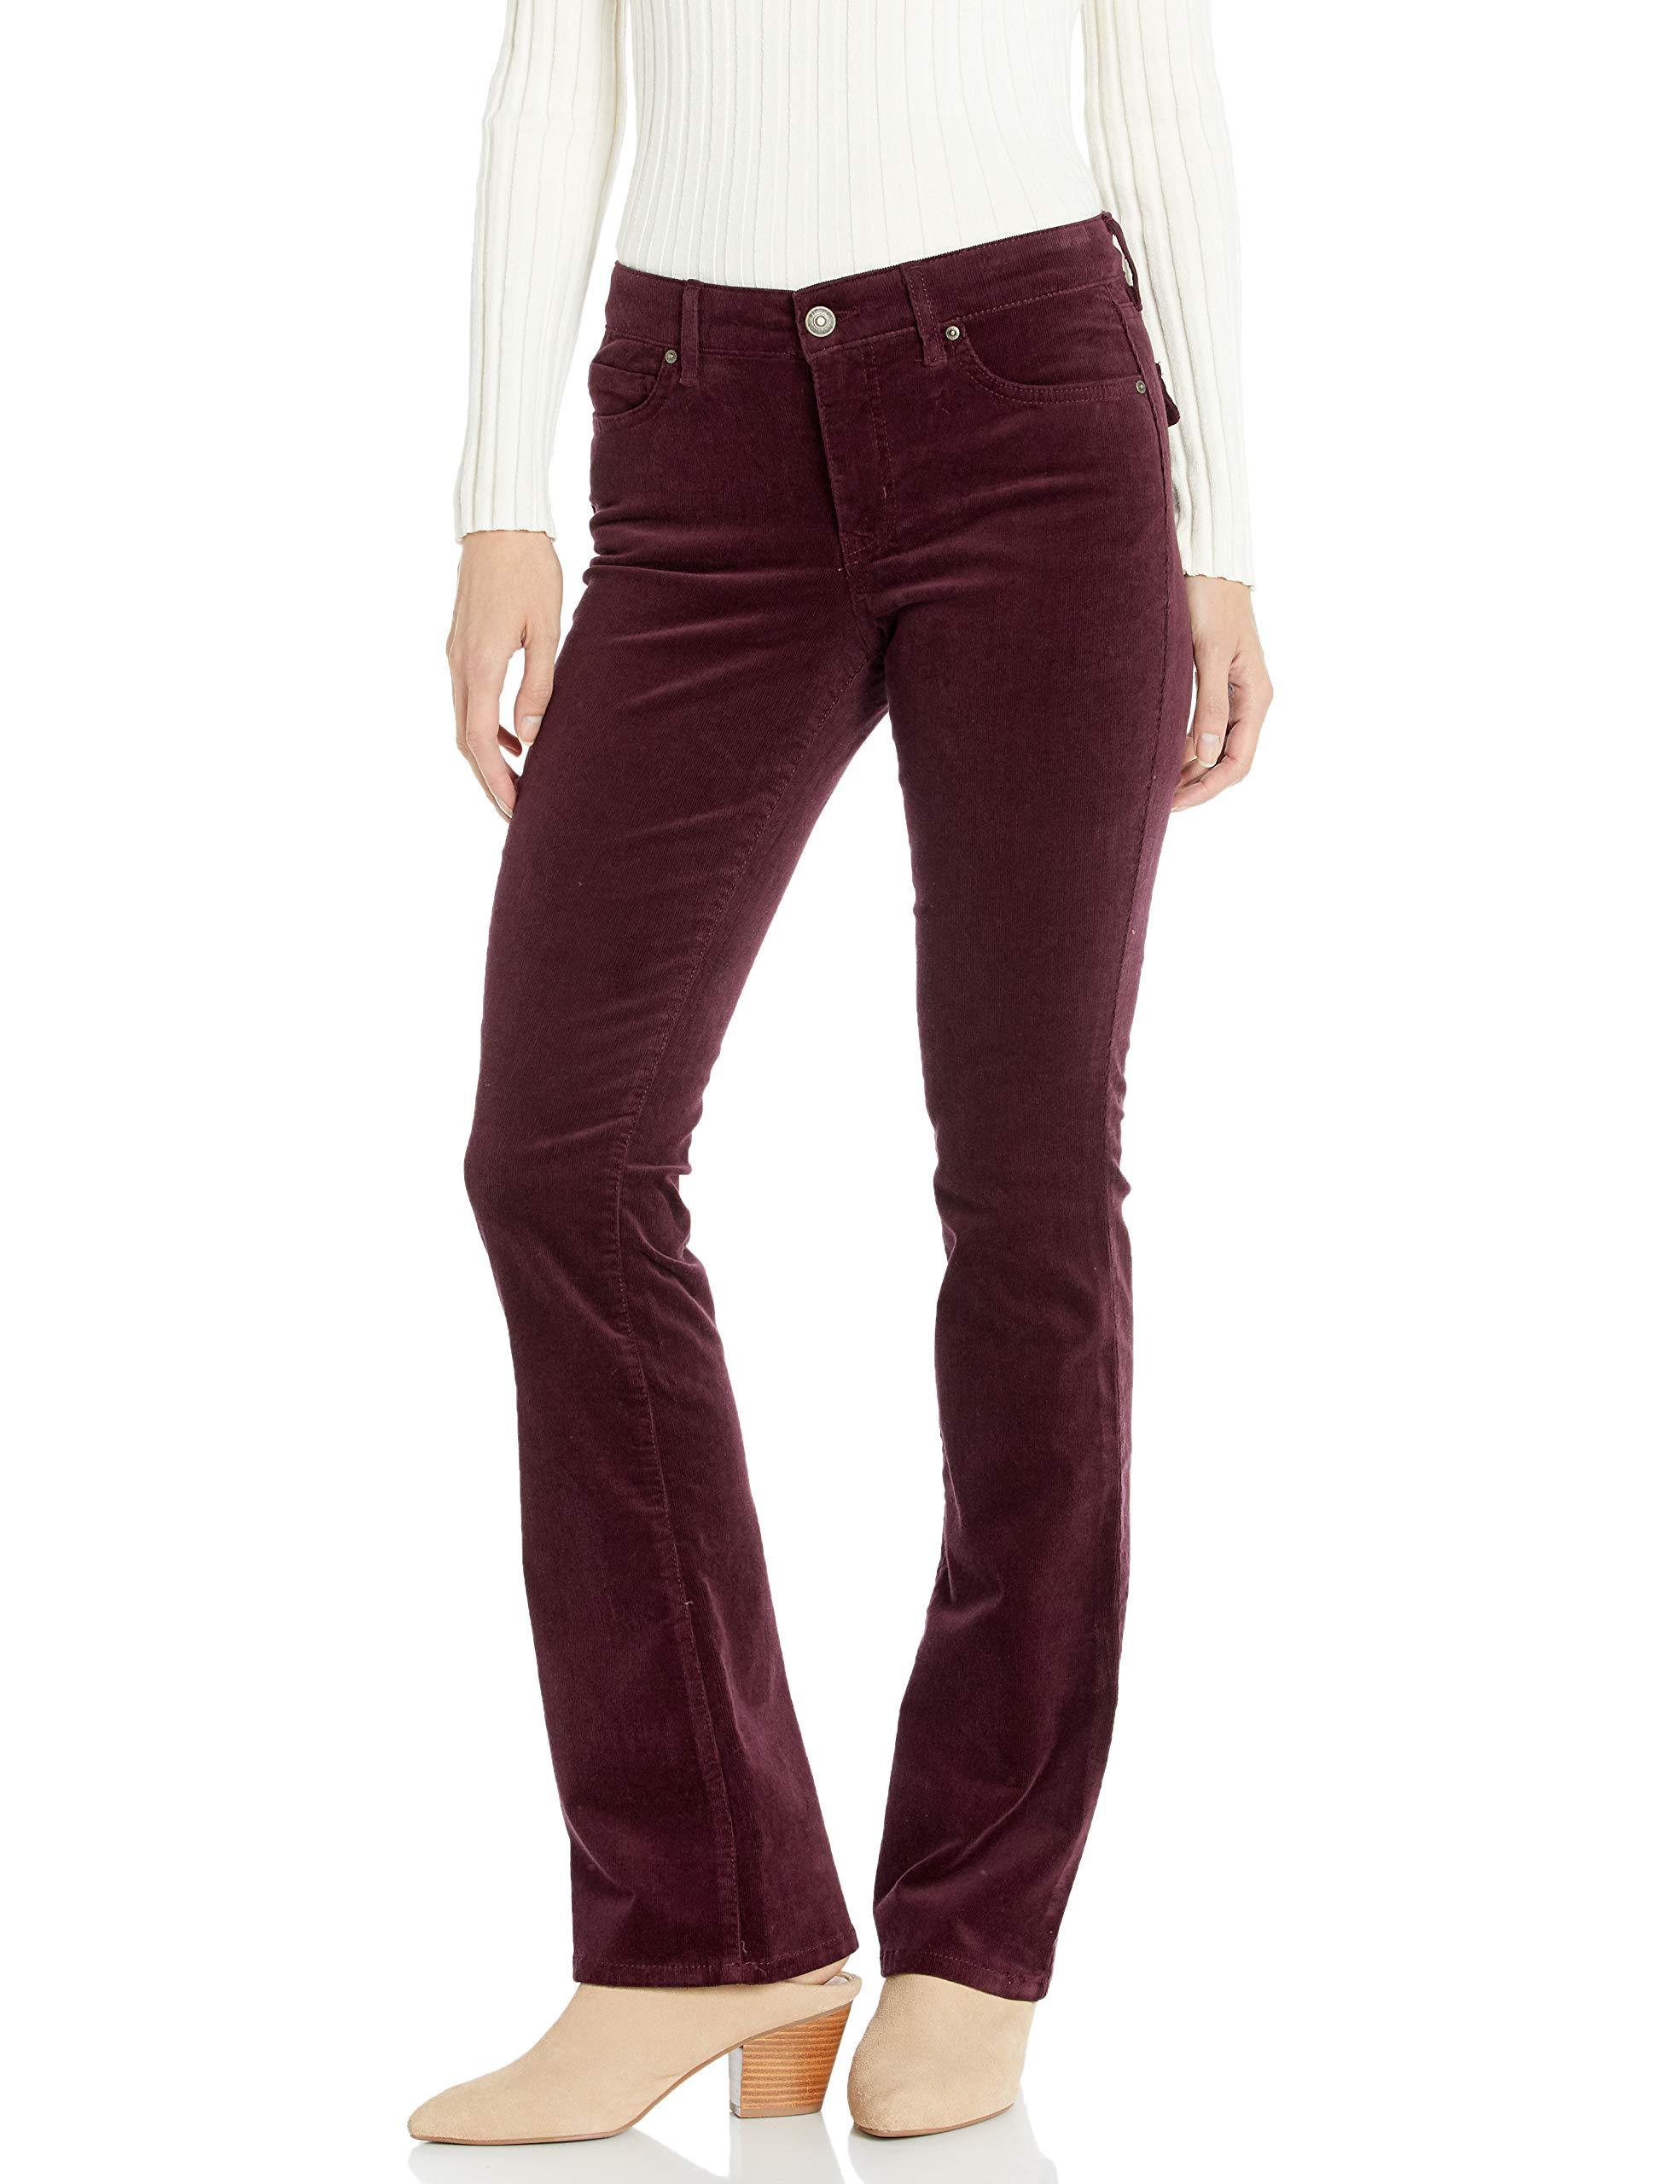 Vintage America Blues Women's Plus Size Vintage Boot Cut Jean, Wine Tasting - Corduroy, 22W by Vintage America Blues